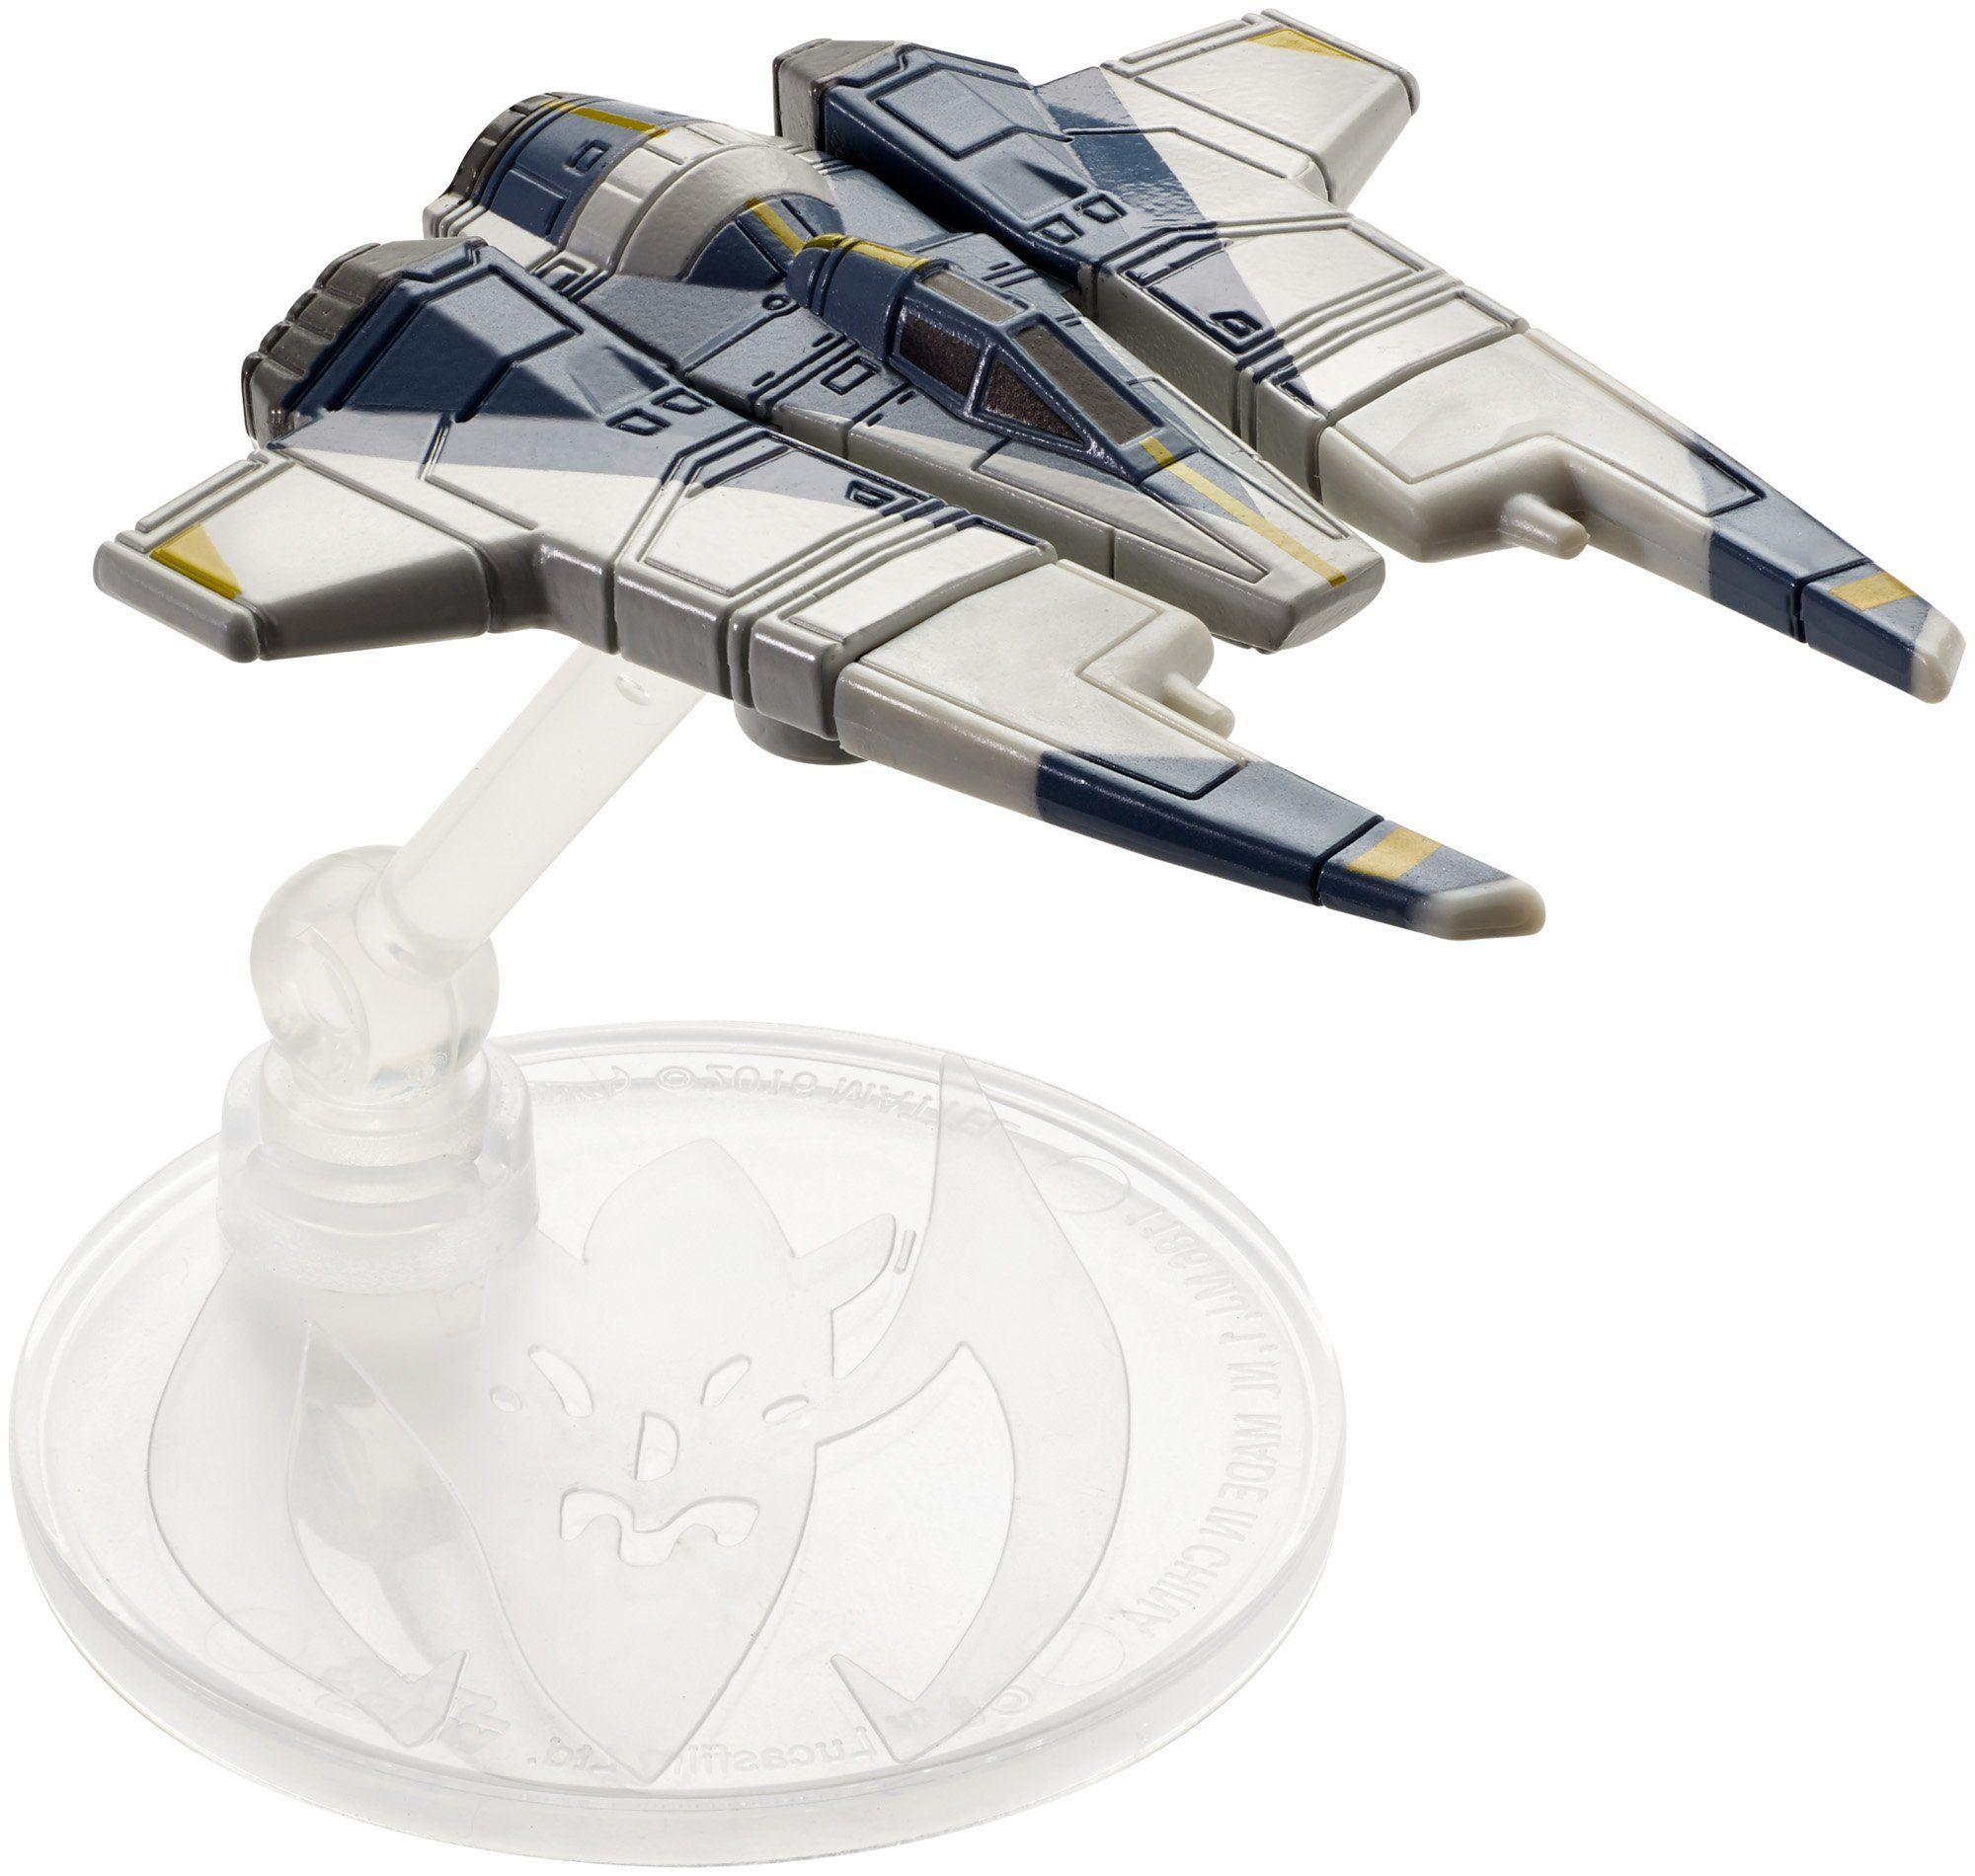 Hot Wheels Star Wars Rogue One Starship Mandalorian Rebels ...